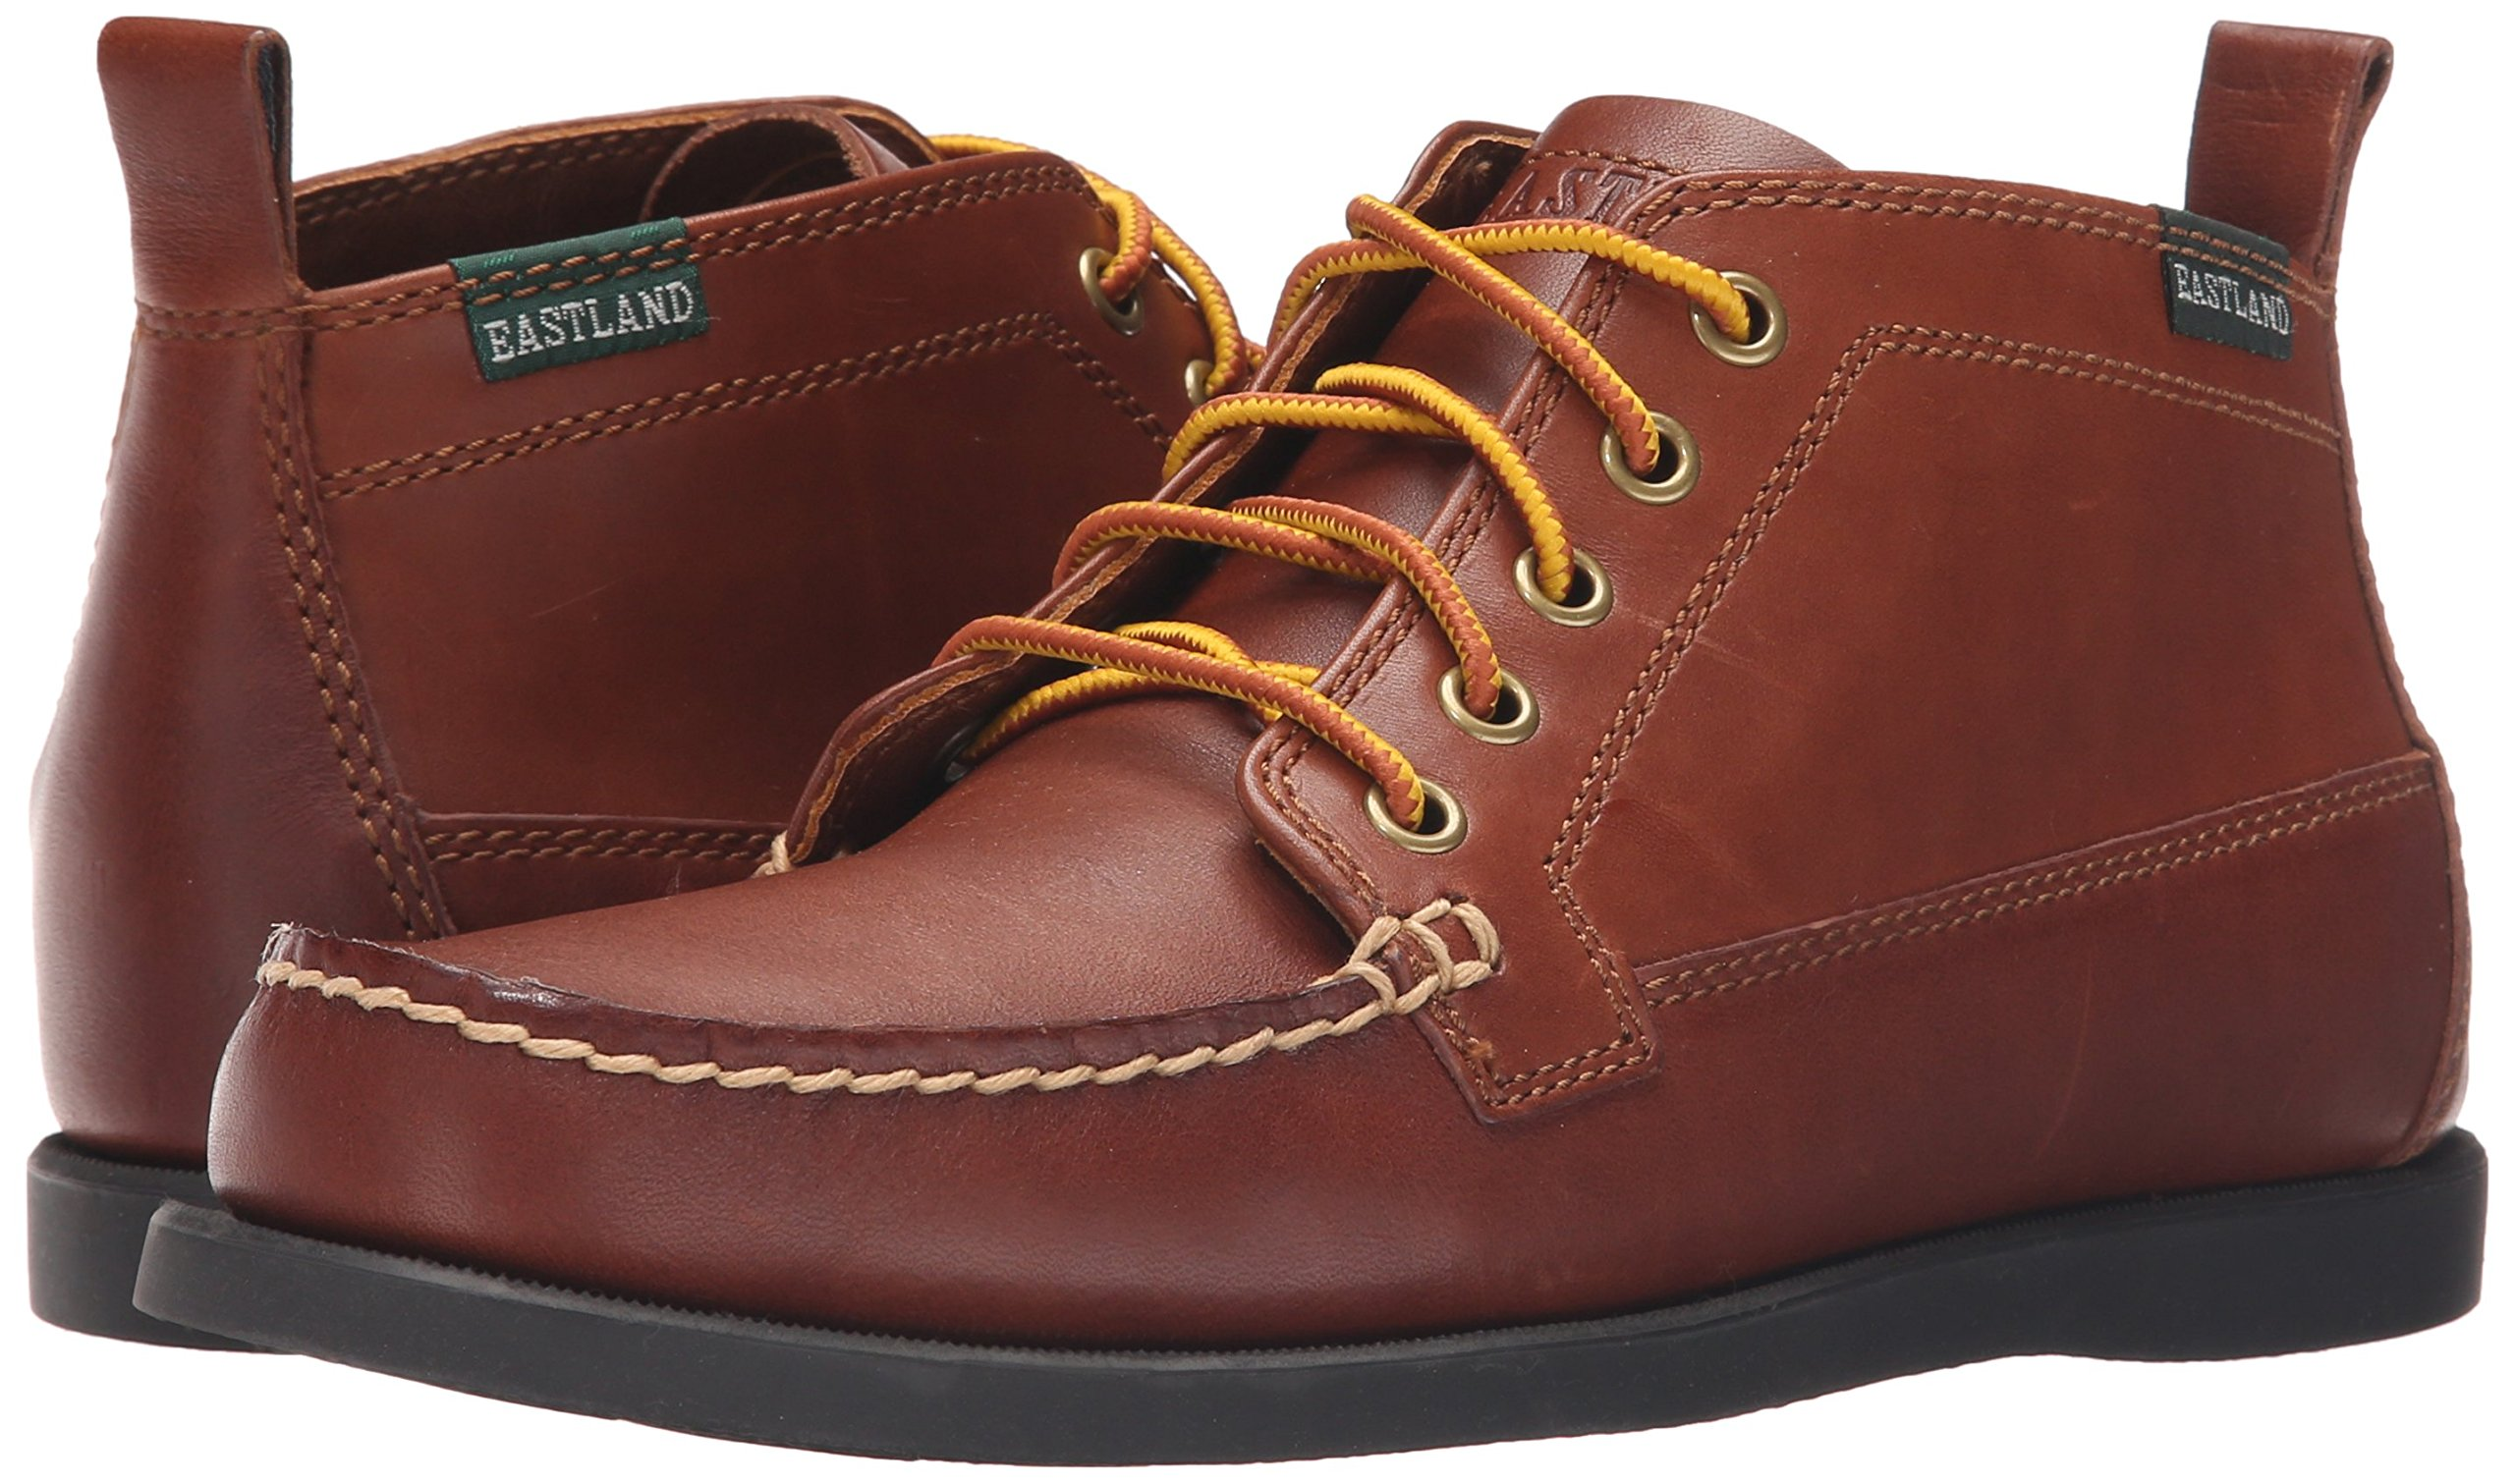 Eastland Men's Seneca Chukka Boot, Tan, 14 W US by Eastland (Image #6)